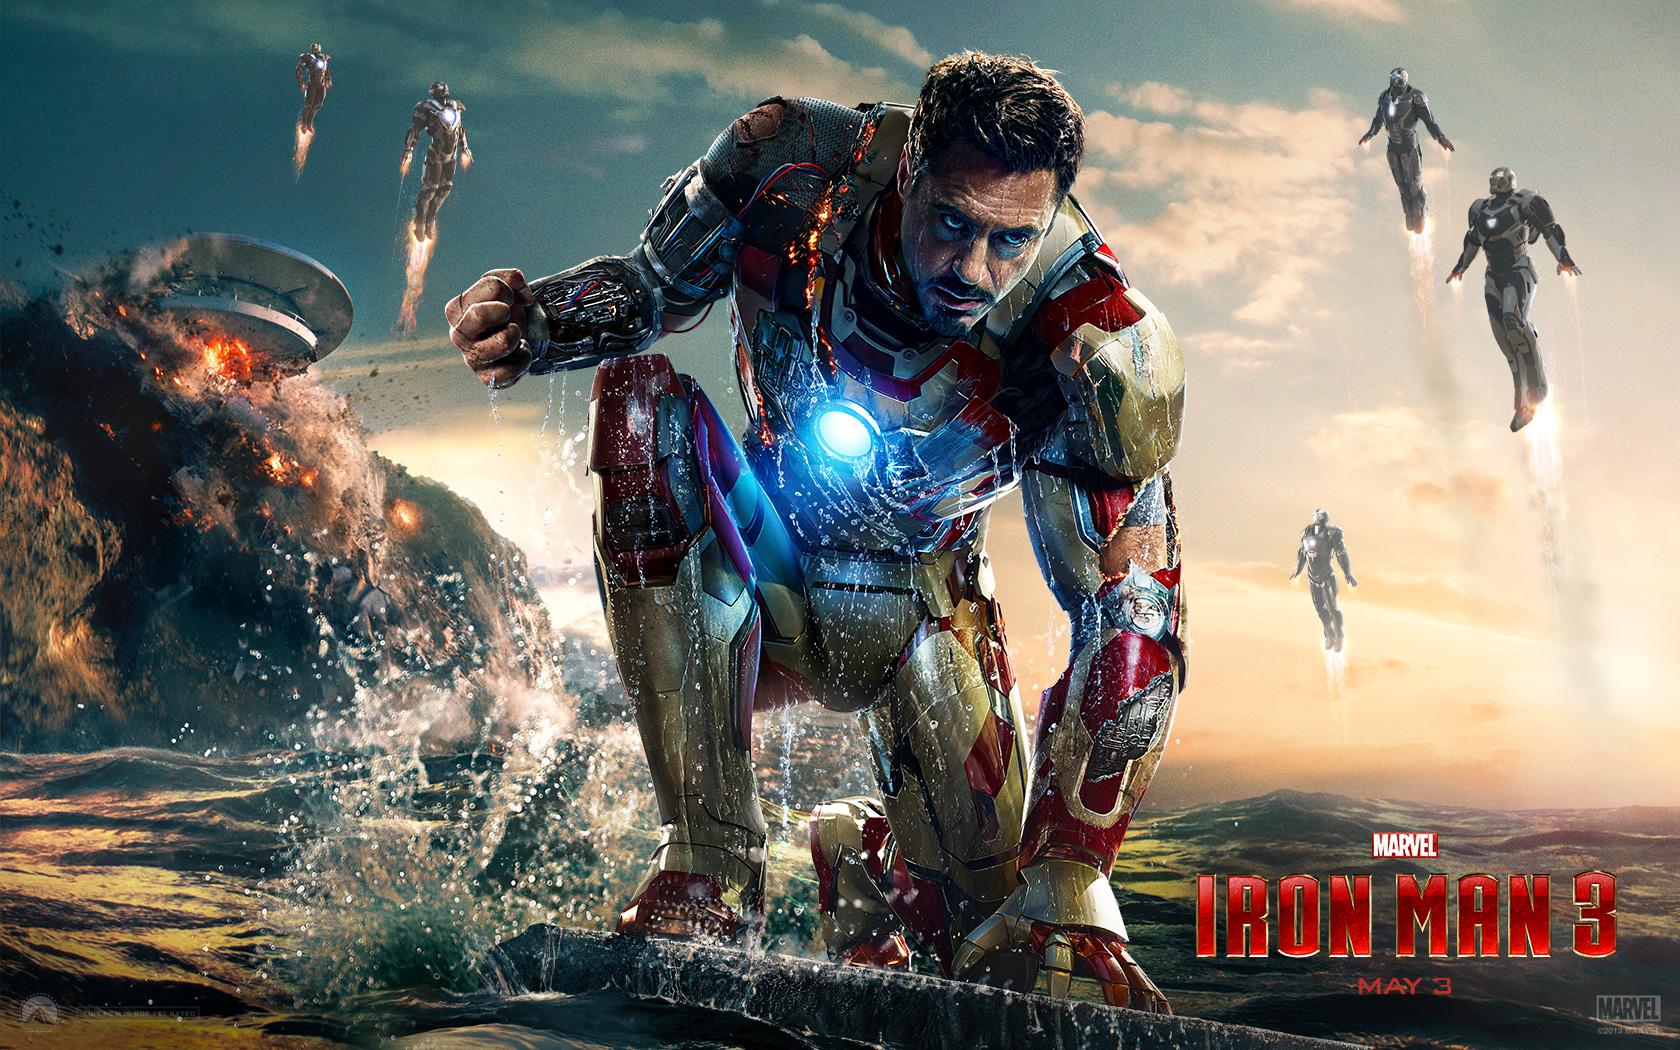 Iron Man 3 Wallpaper 1080pHD Wallpapers 1680x1050